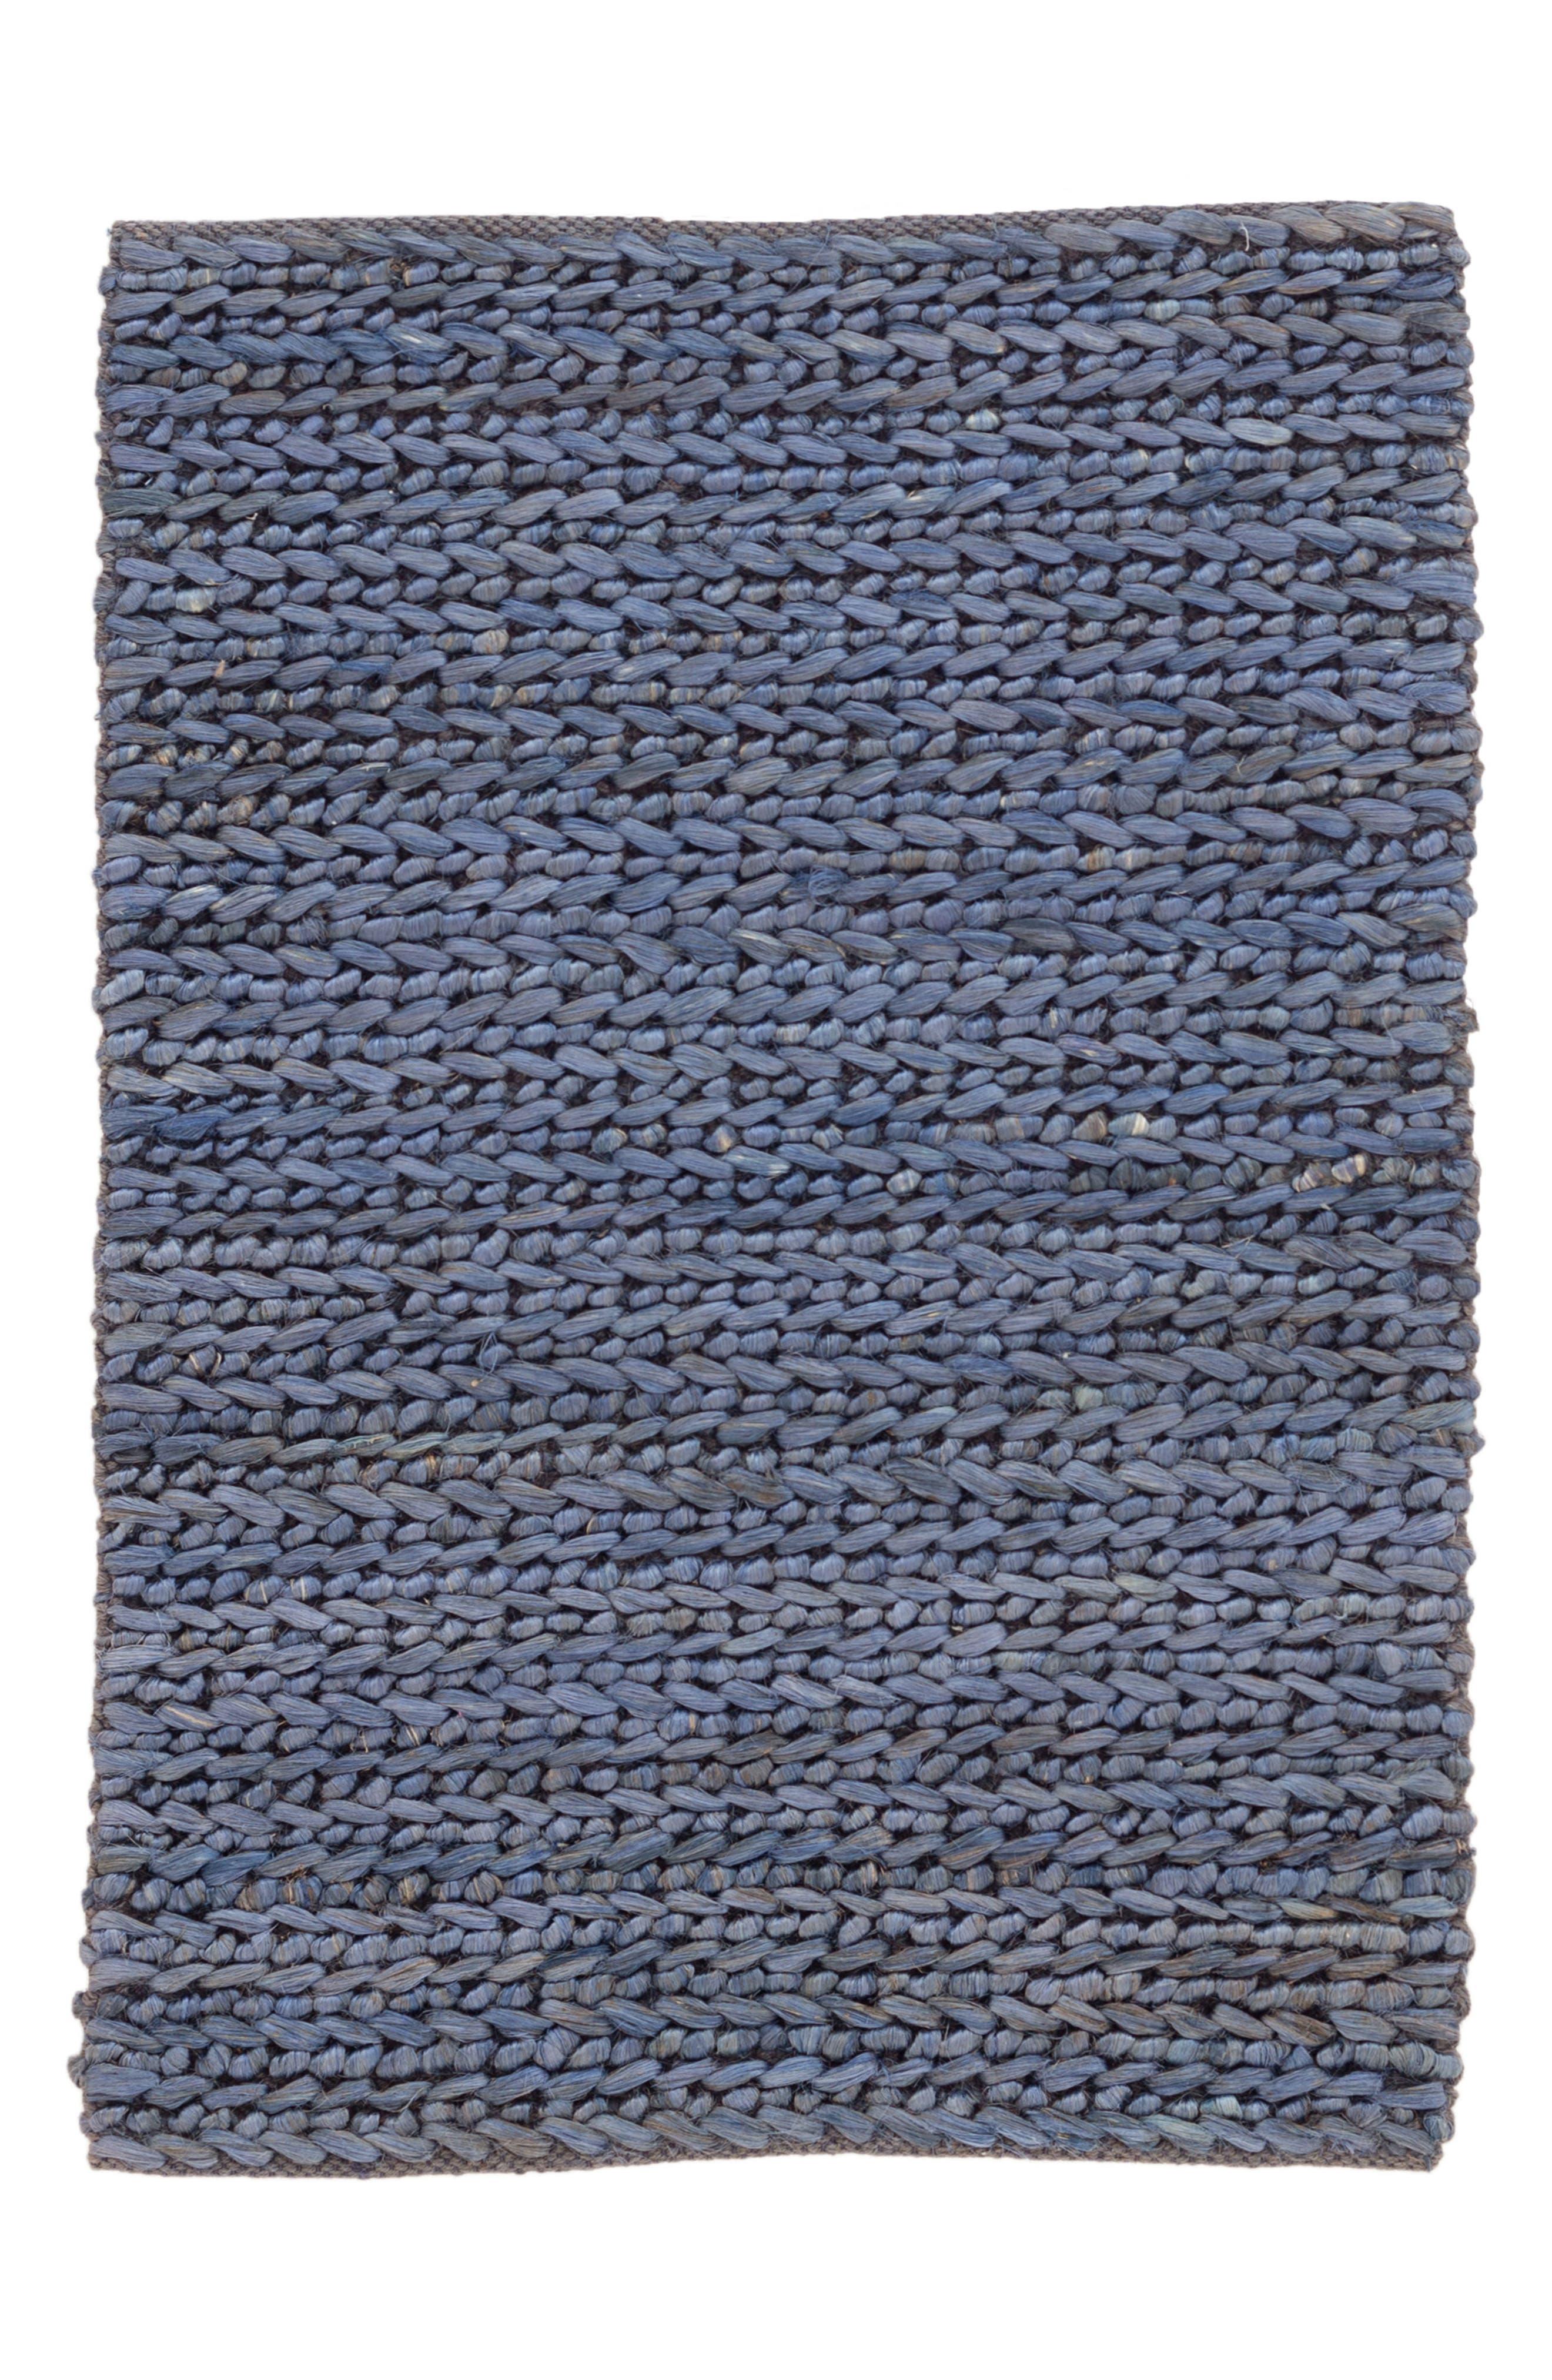 Woven Jute Rug,                         Main,                         color, BLUE